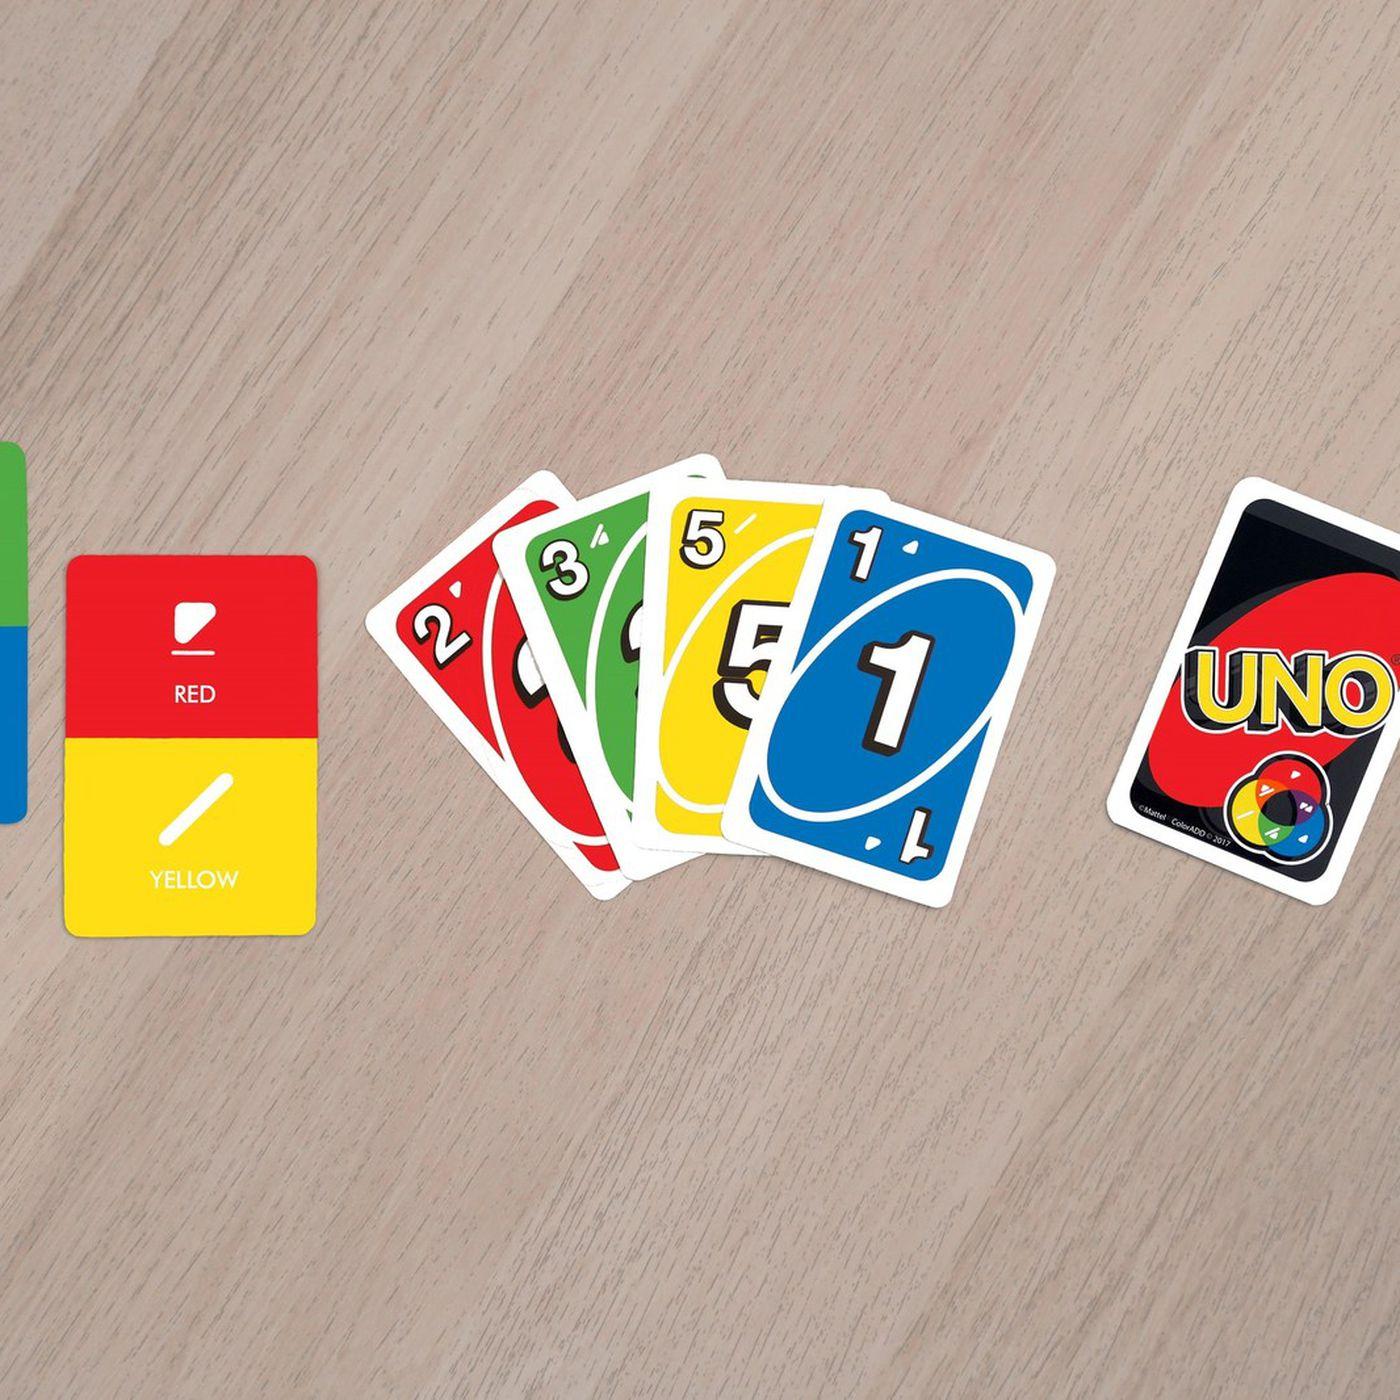 Games for colorblind - Games For Colorblind 9